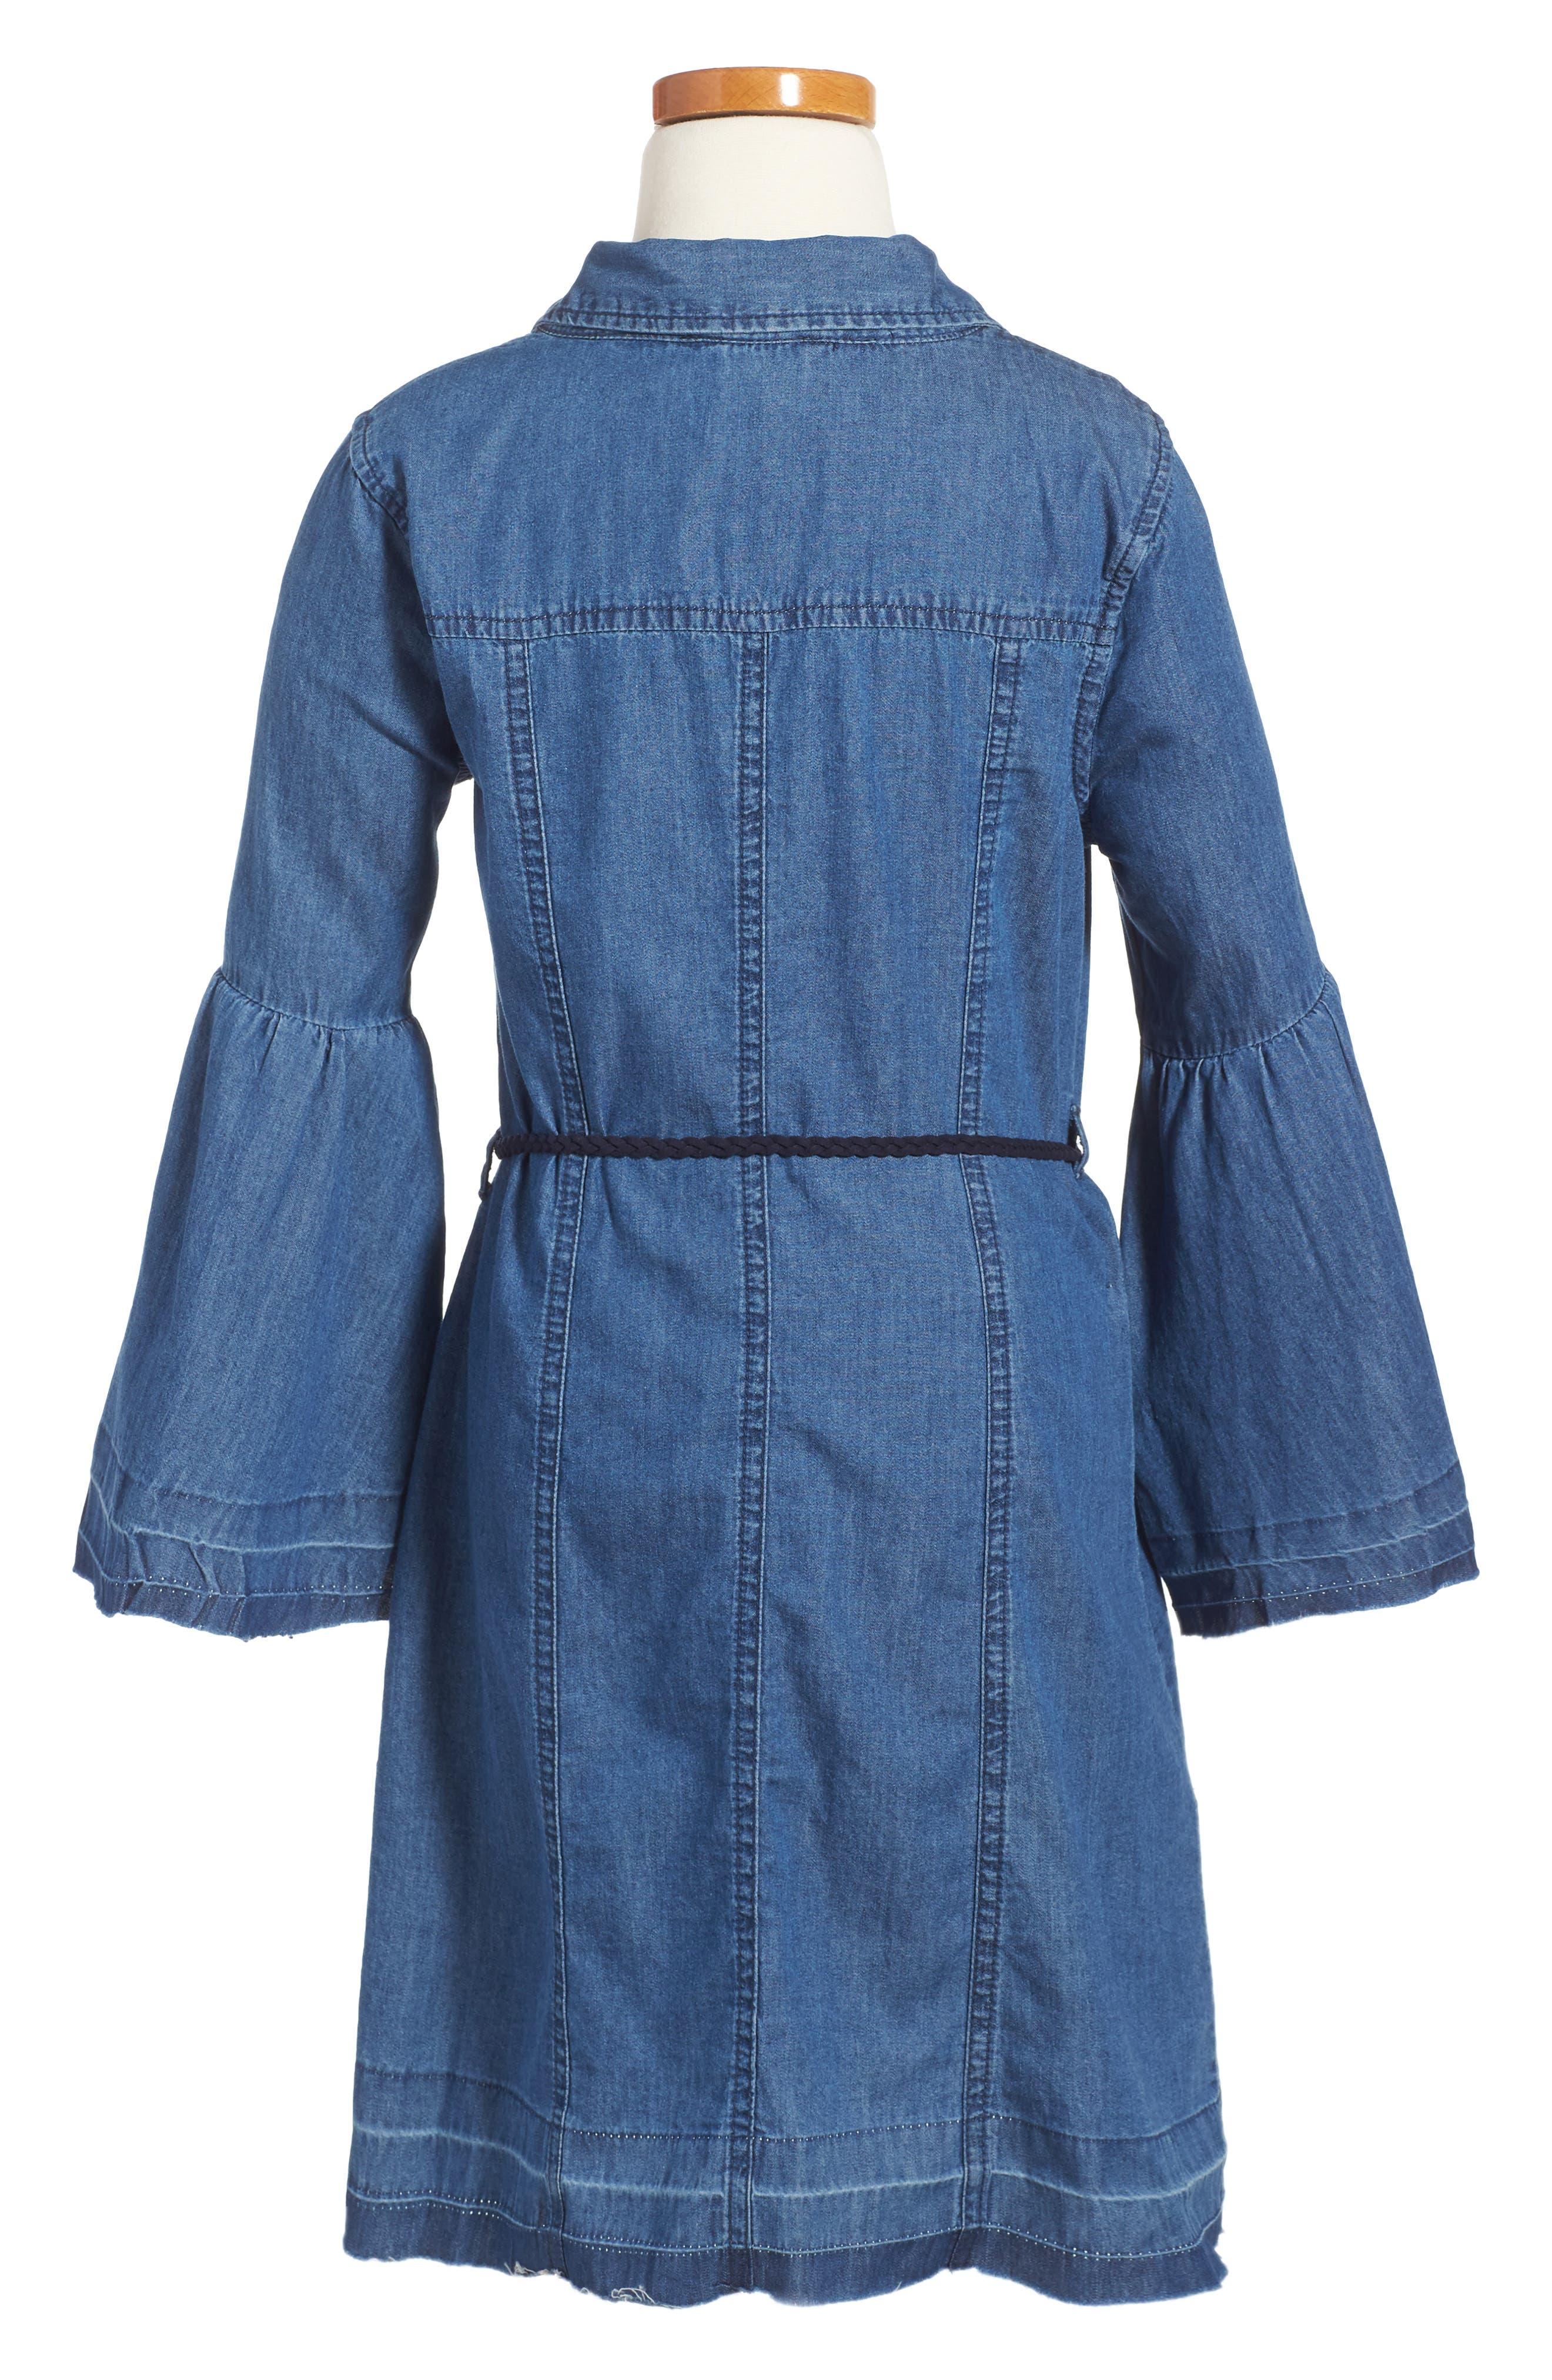 Bell Sleeve Chambray Dress,                             Alternate thumbnail 2, color,                             425